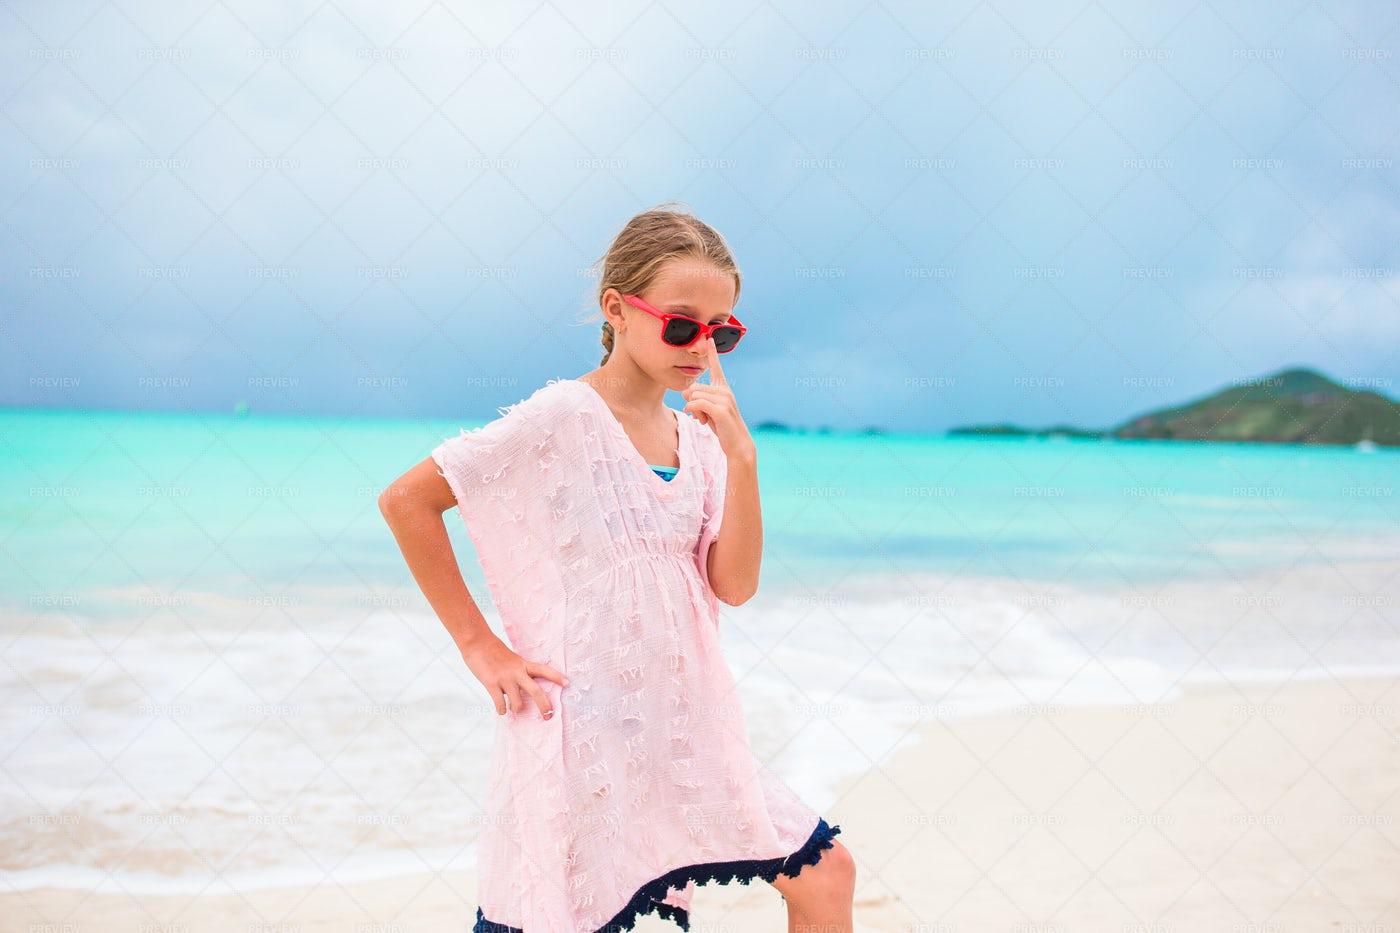 Beach Portrait Of Girl: Stock Photos